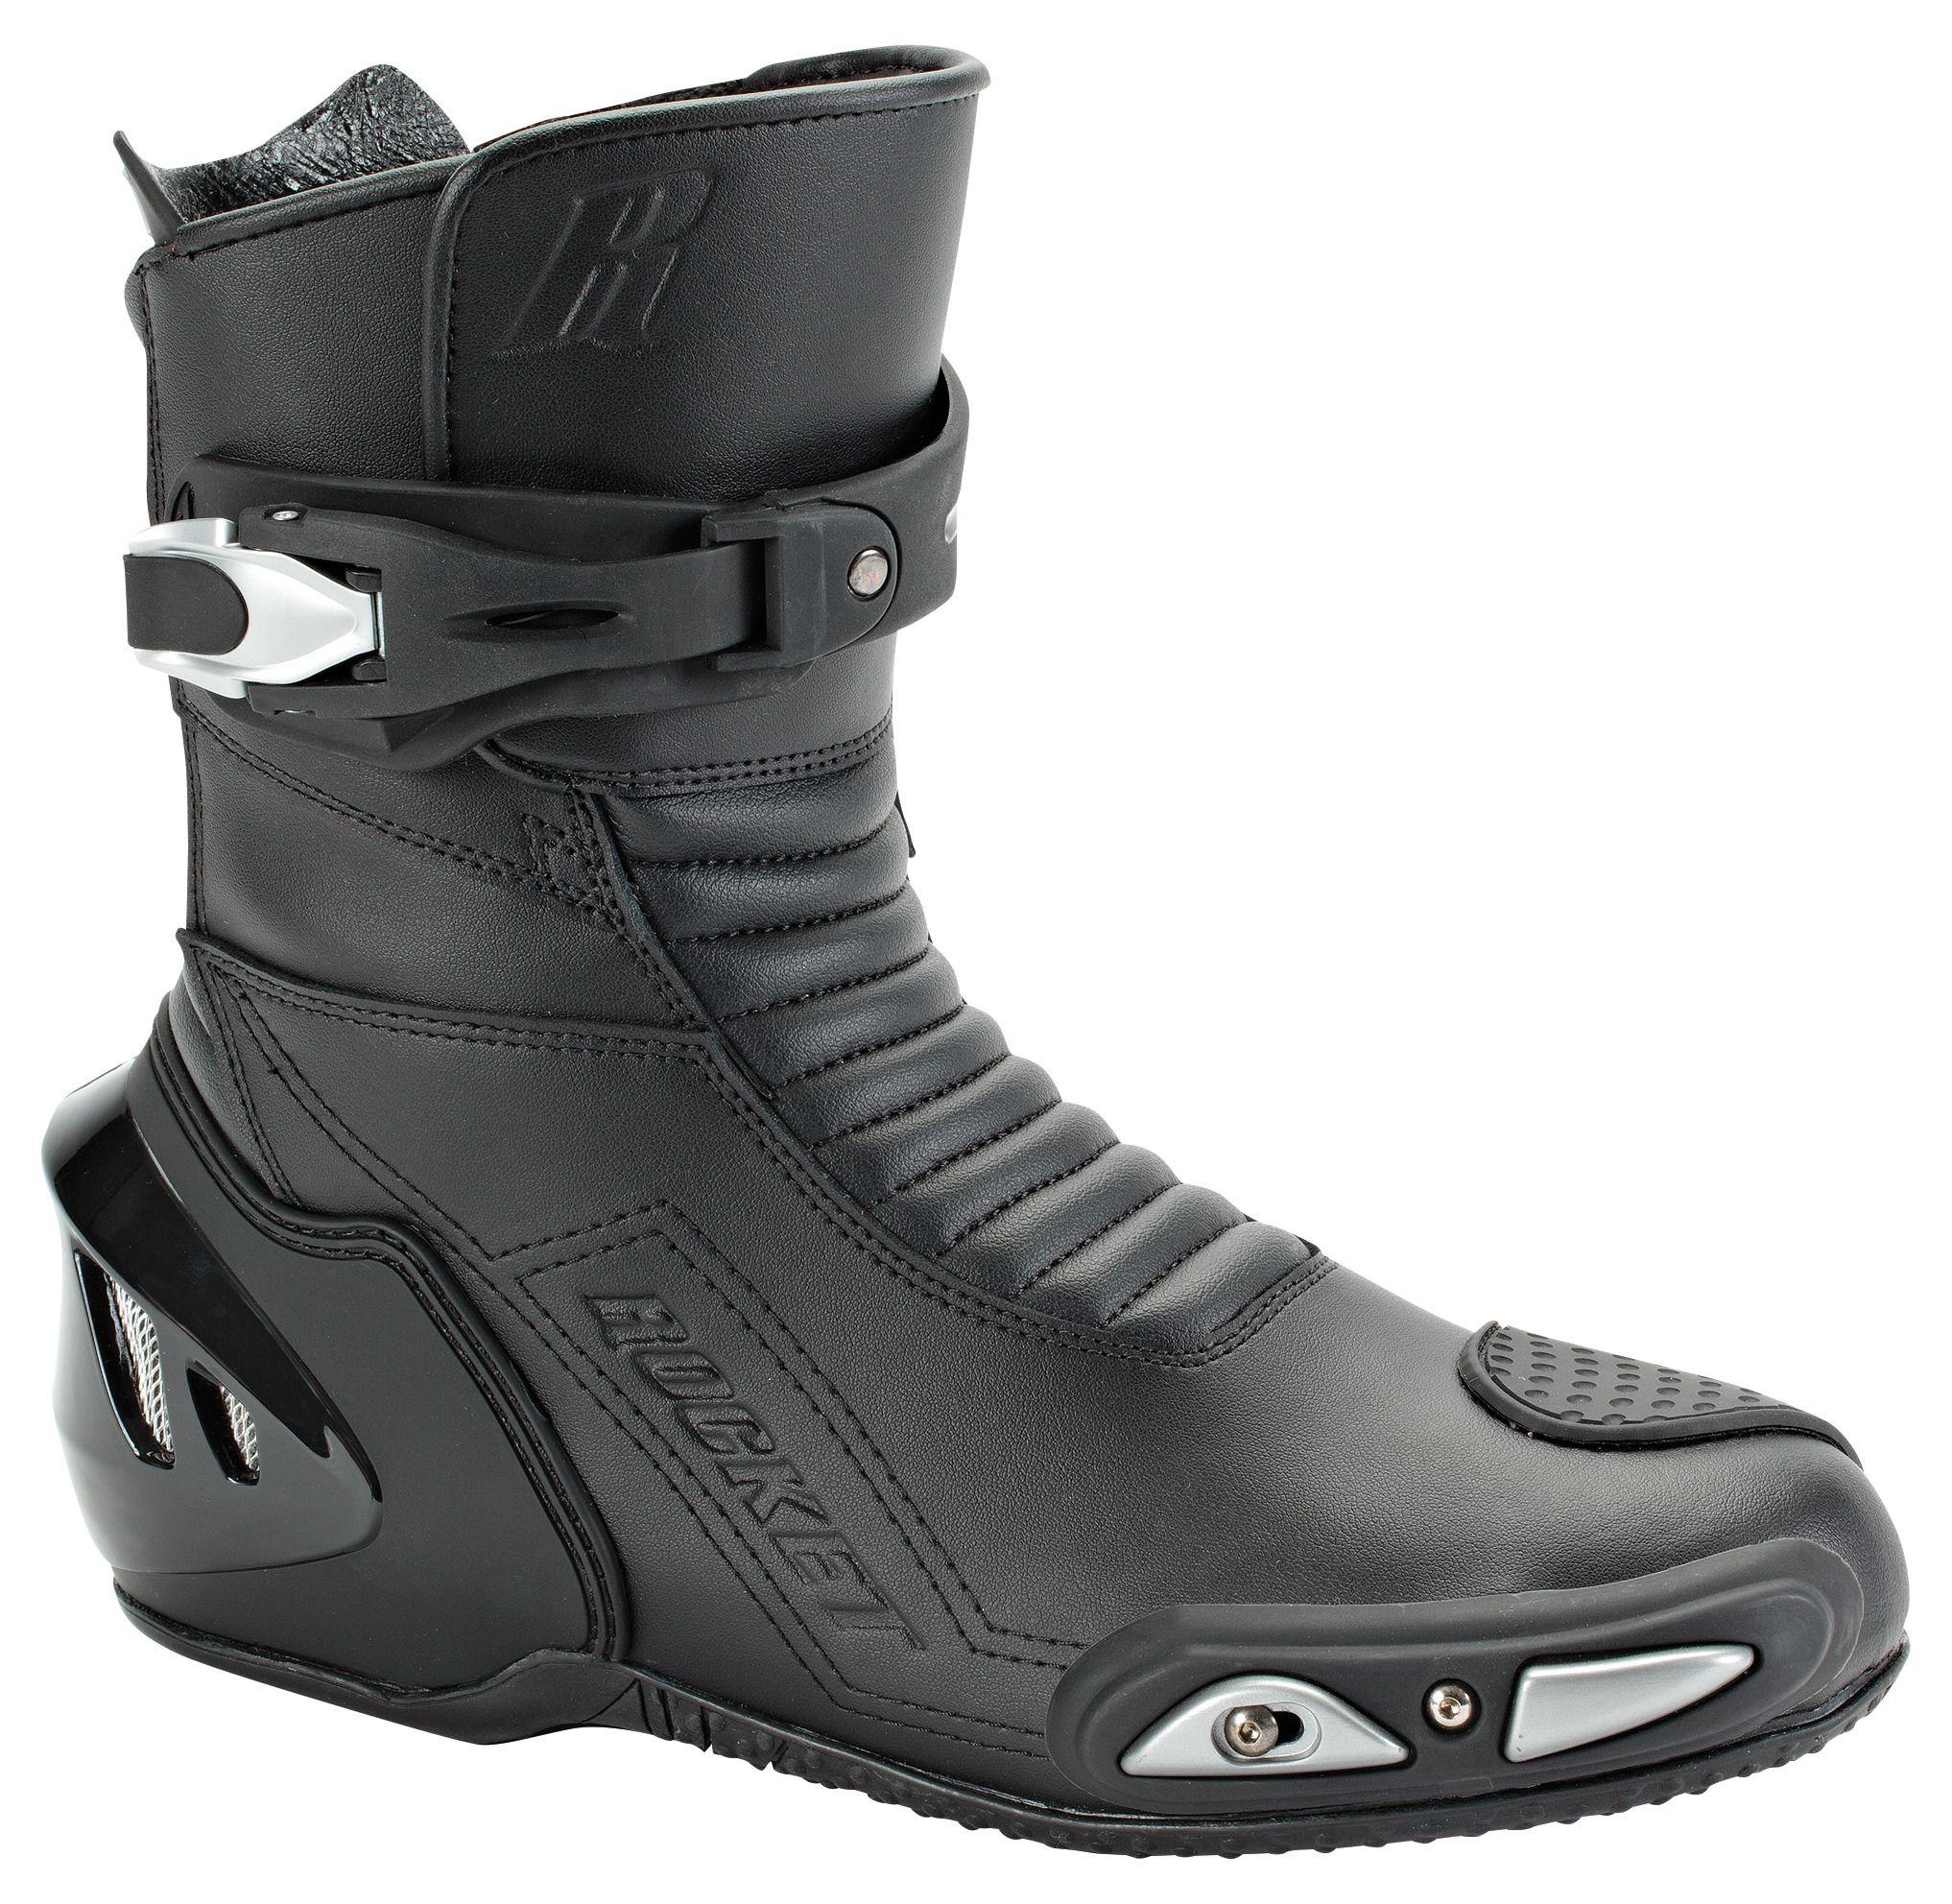 29fbf1309c4 Joe Rocket Super Street RX14 Boots | 20% ($36.00) Off!